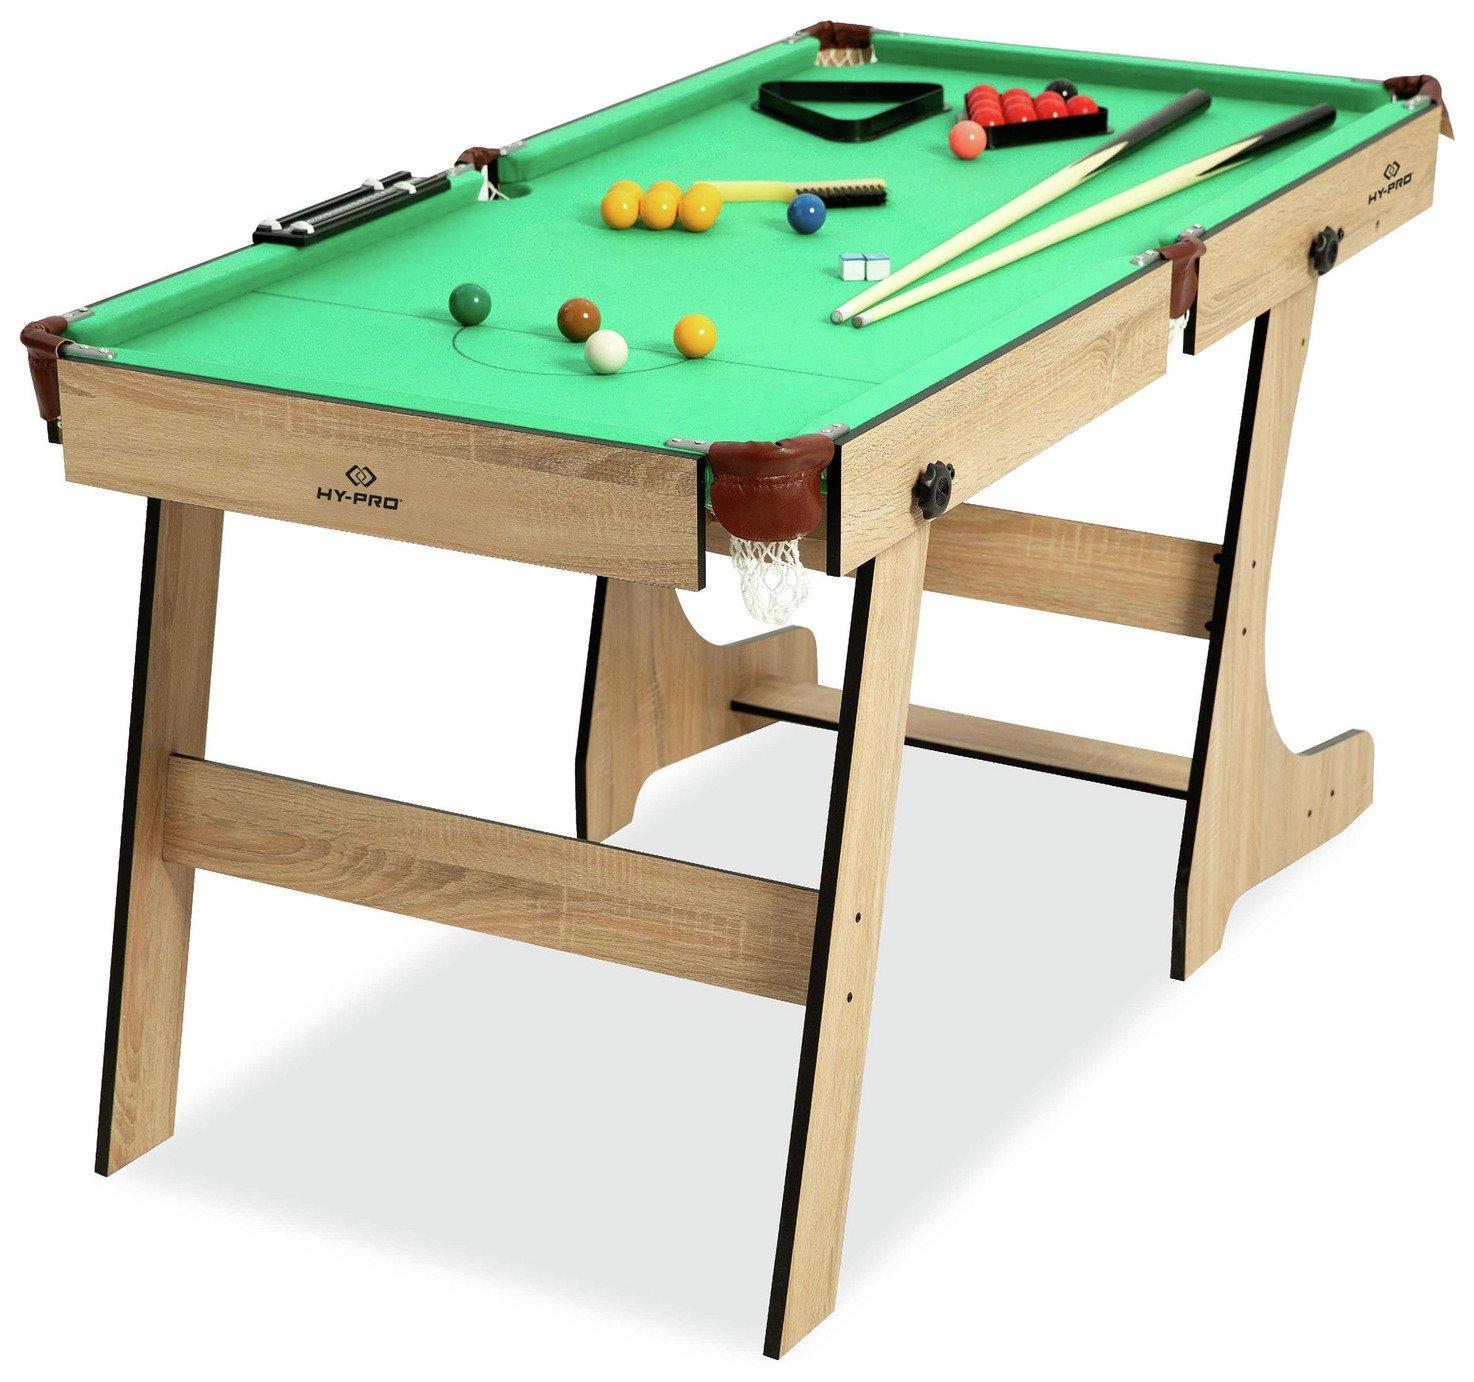 table pool. play video table pool e